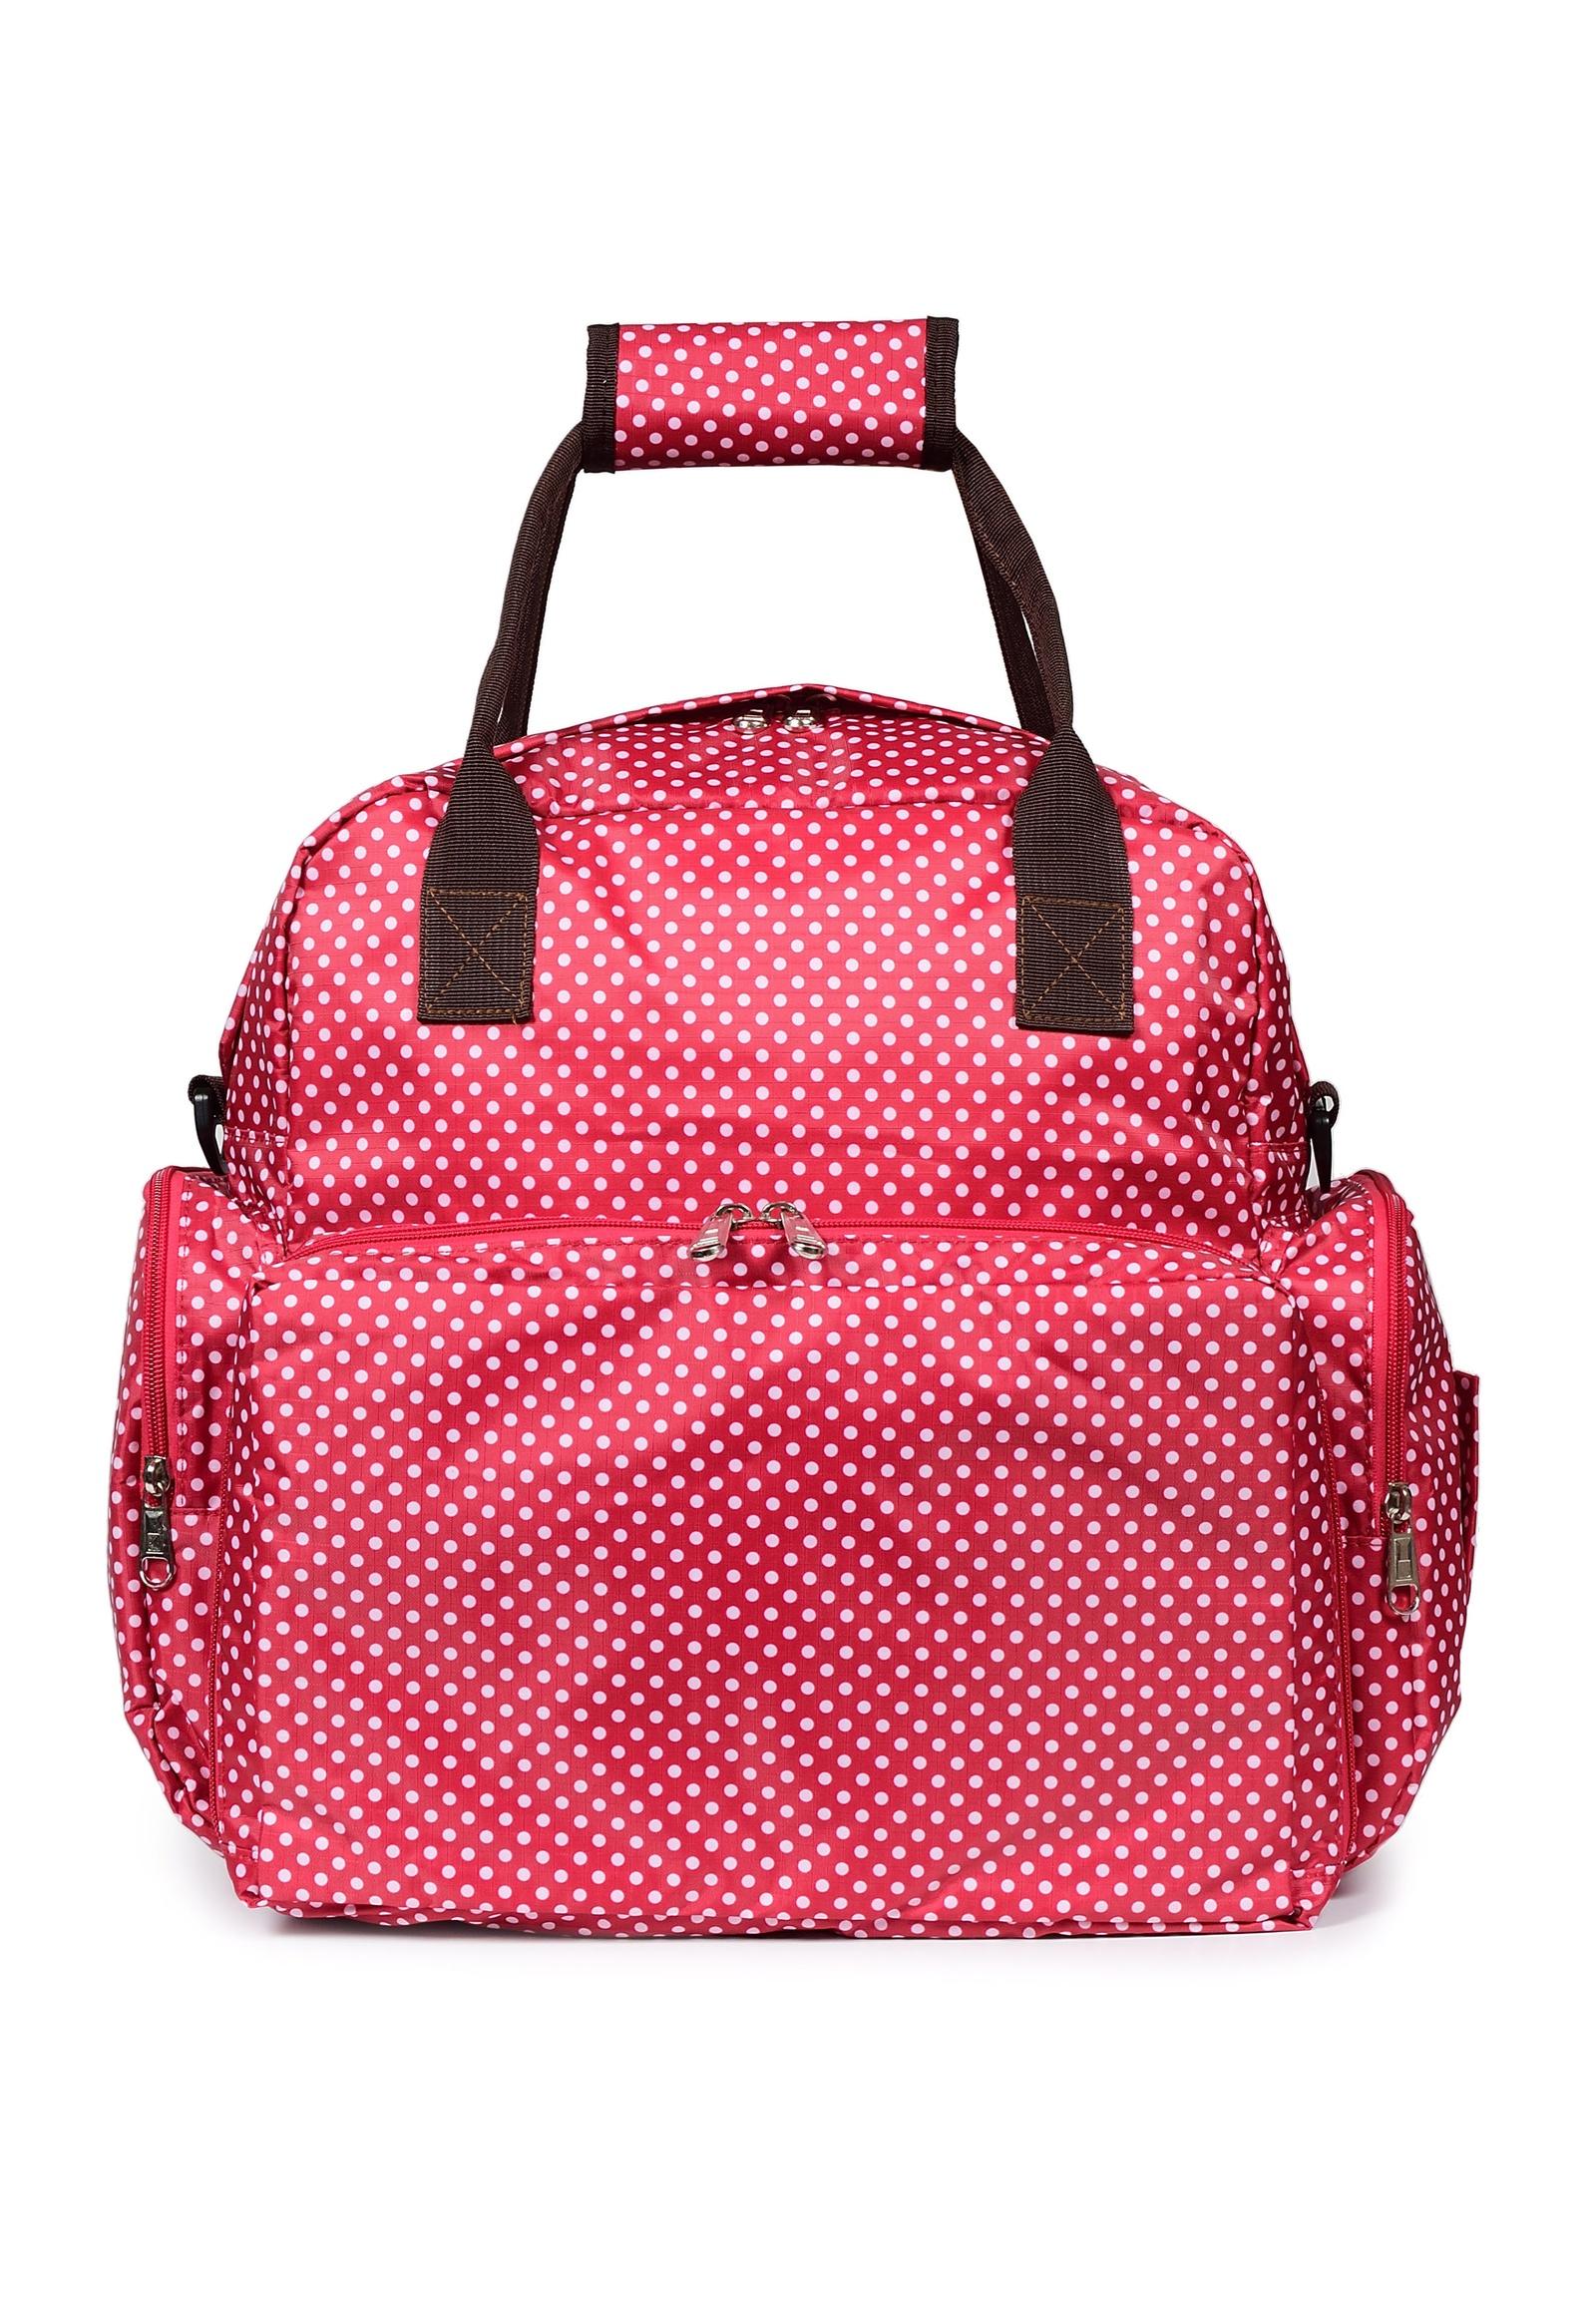 Фото - Сумка-рюкзак для мам, Ankommling. BMASPPi ай ши oiwas плечо сумка красные мешки отдыха рюкзак ocb4187